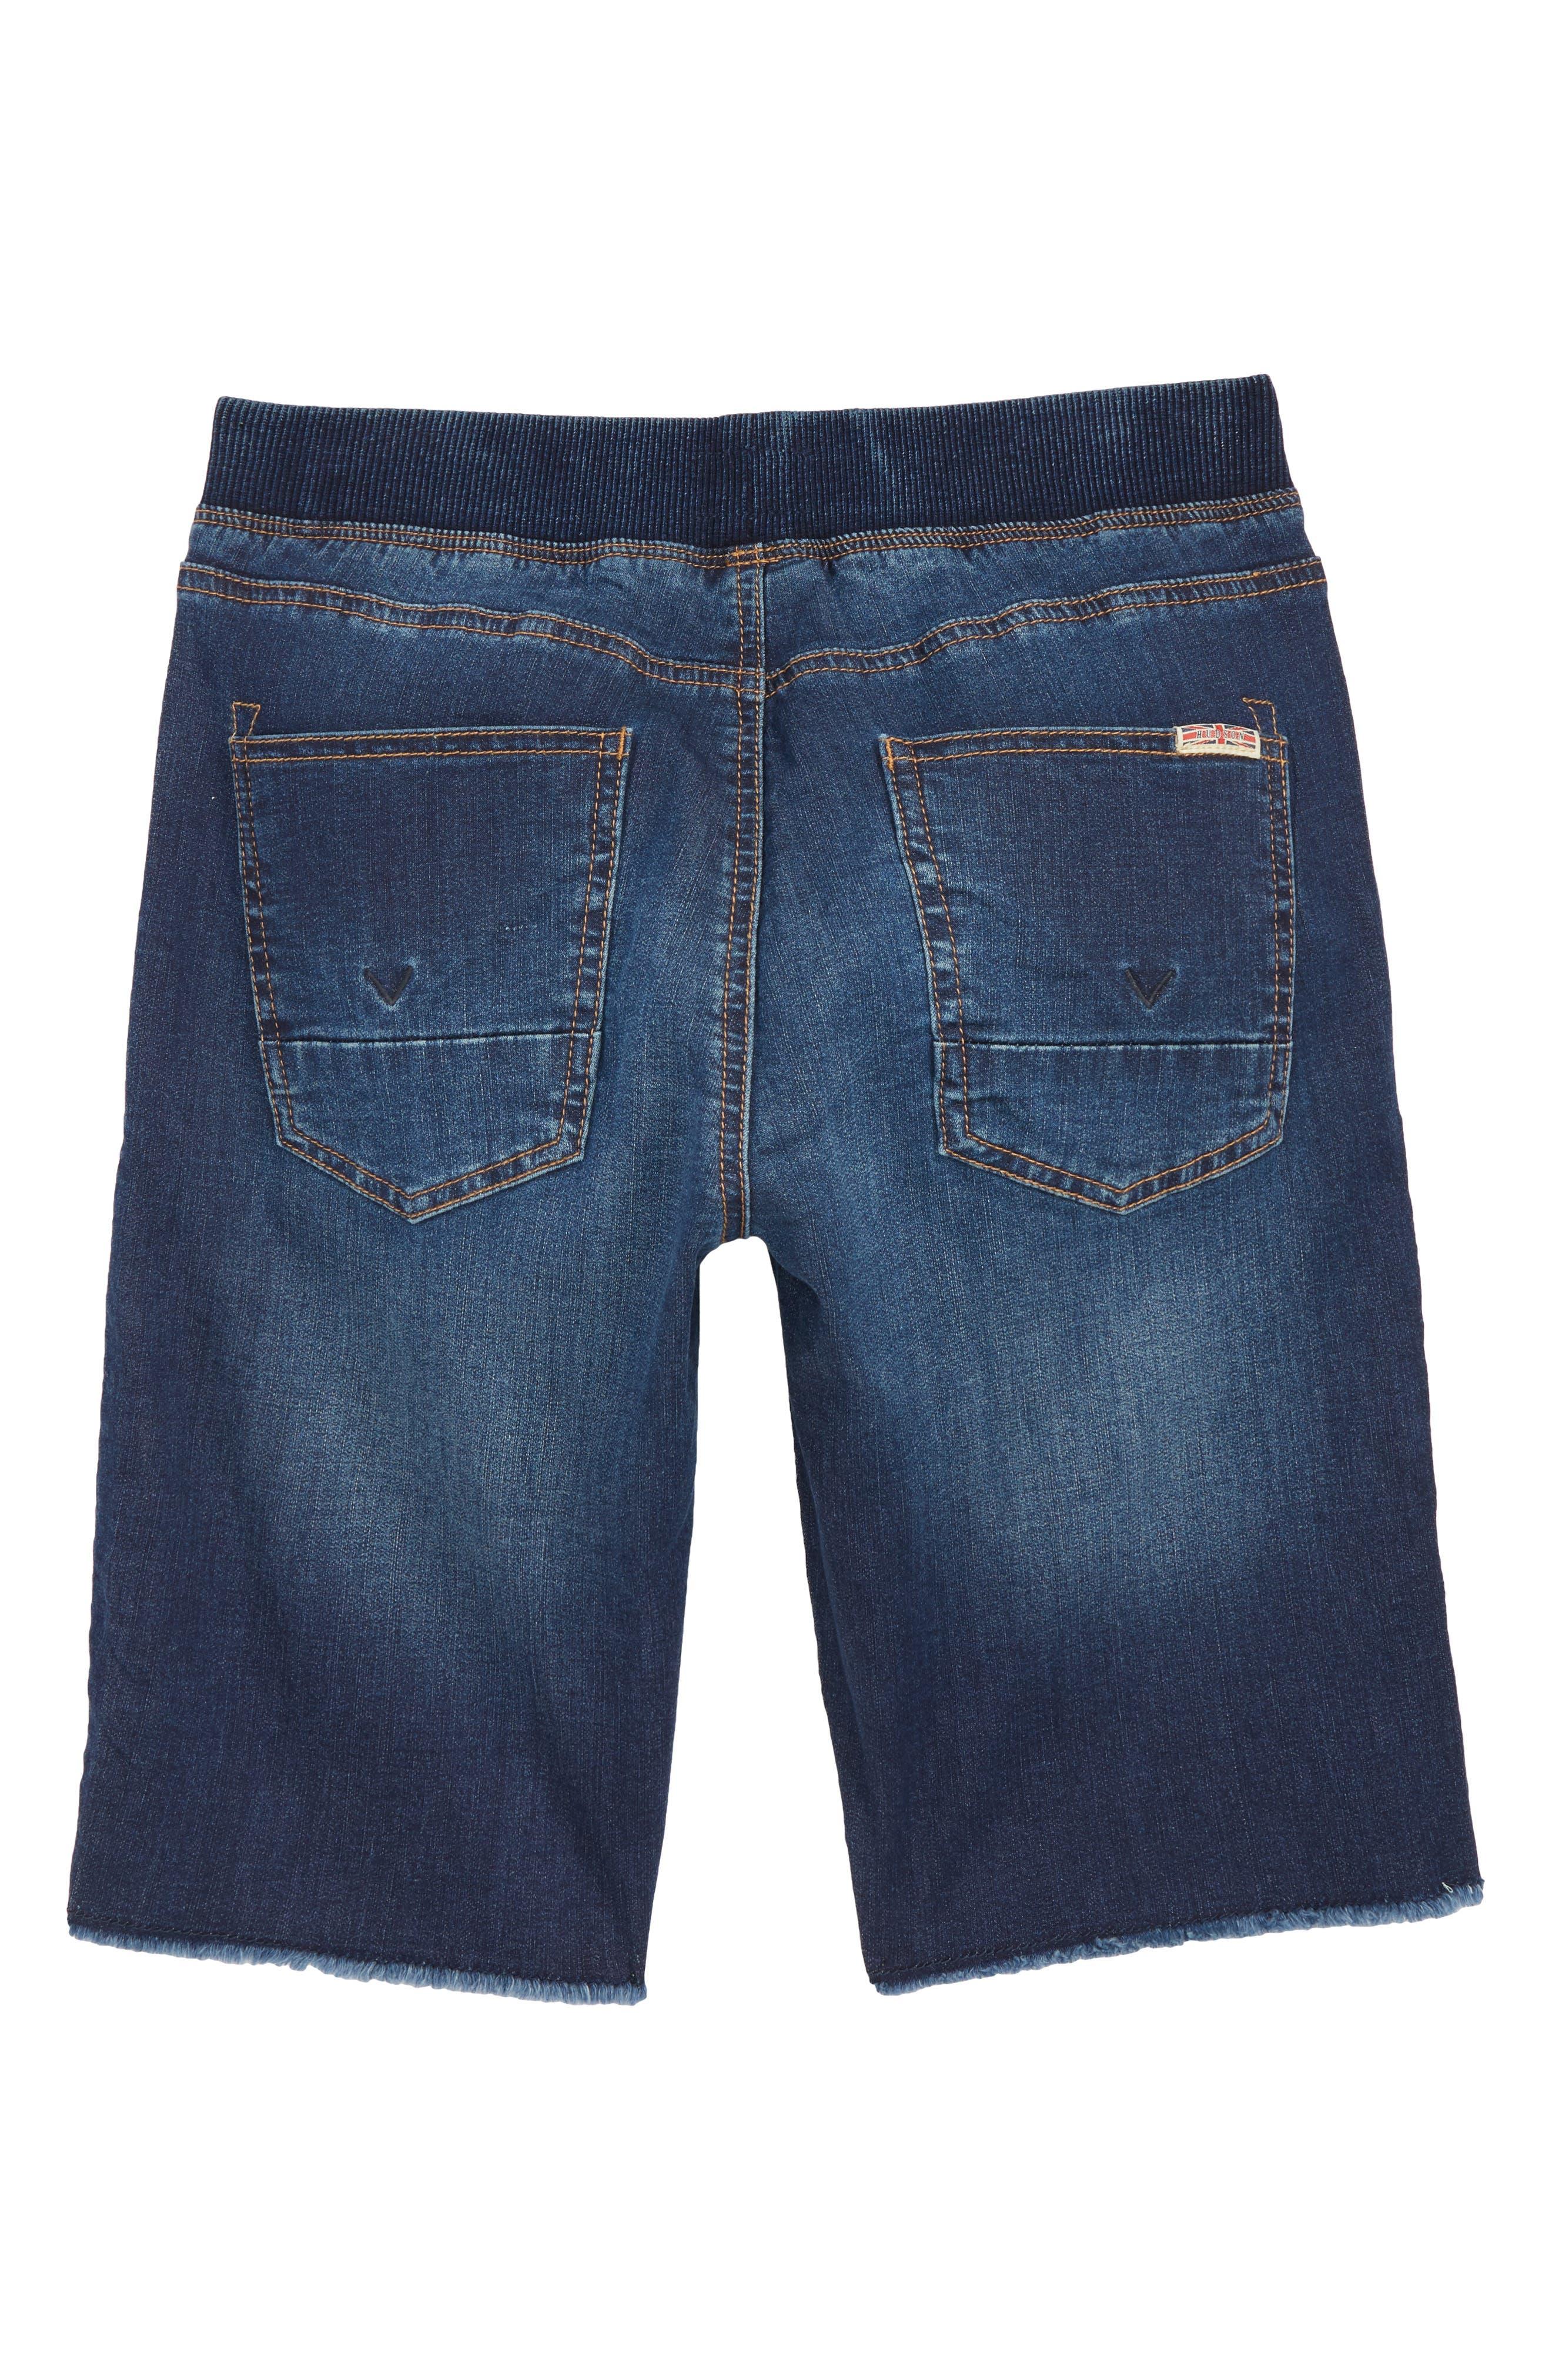 Knit Cutoff Denim Shorts,                             Alternate thumbnail 2, color,                             481